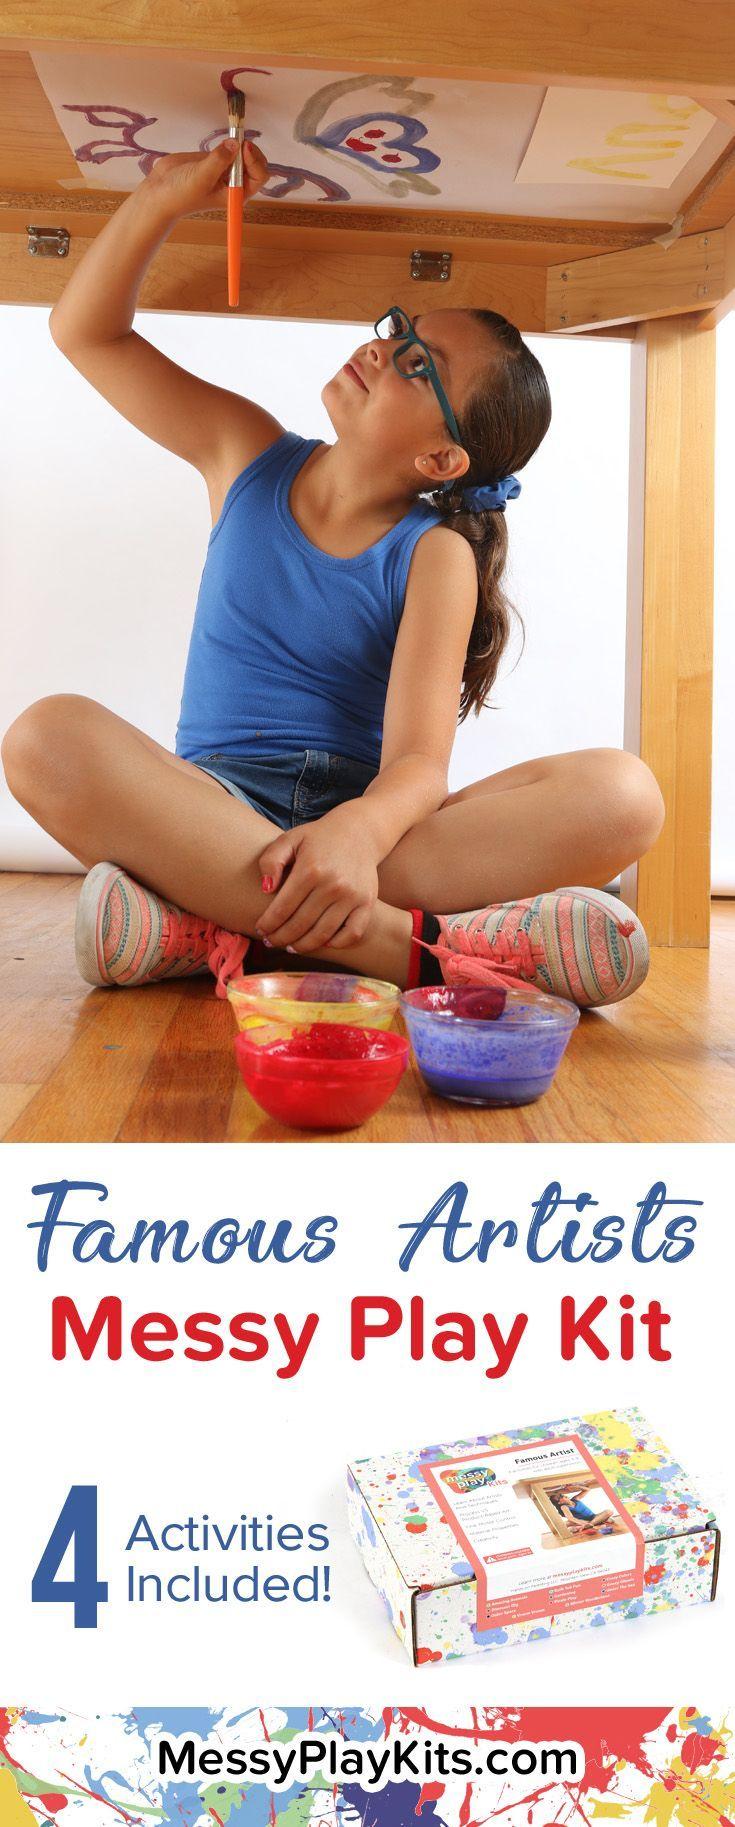 Art Kit For Kids Craft Kit Monthly Subscription Box For Kids